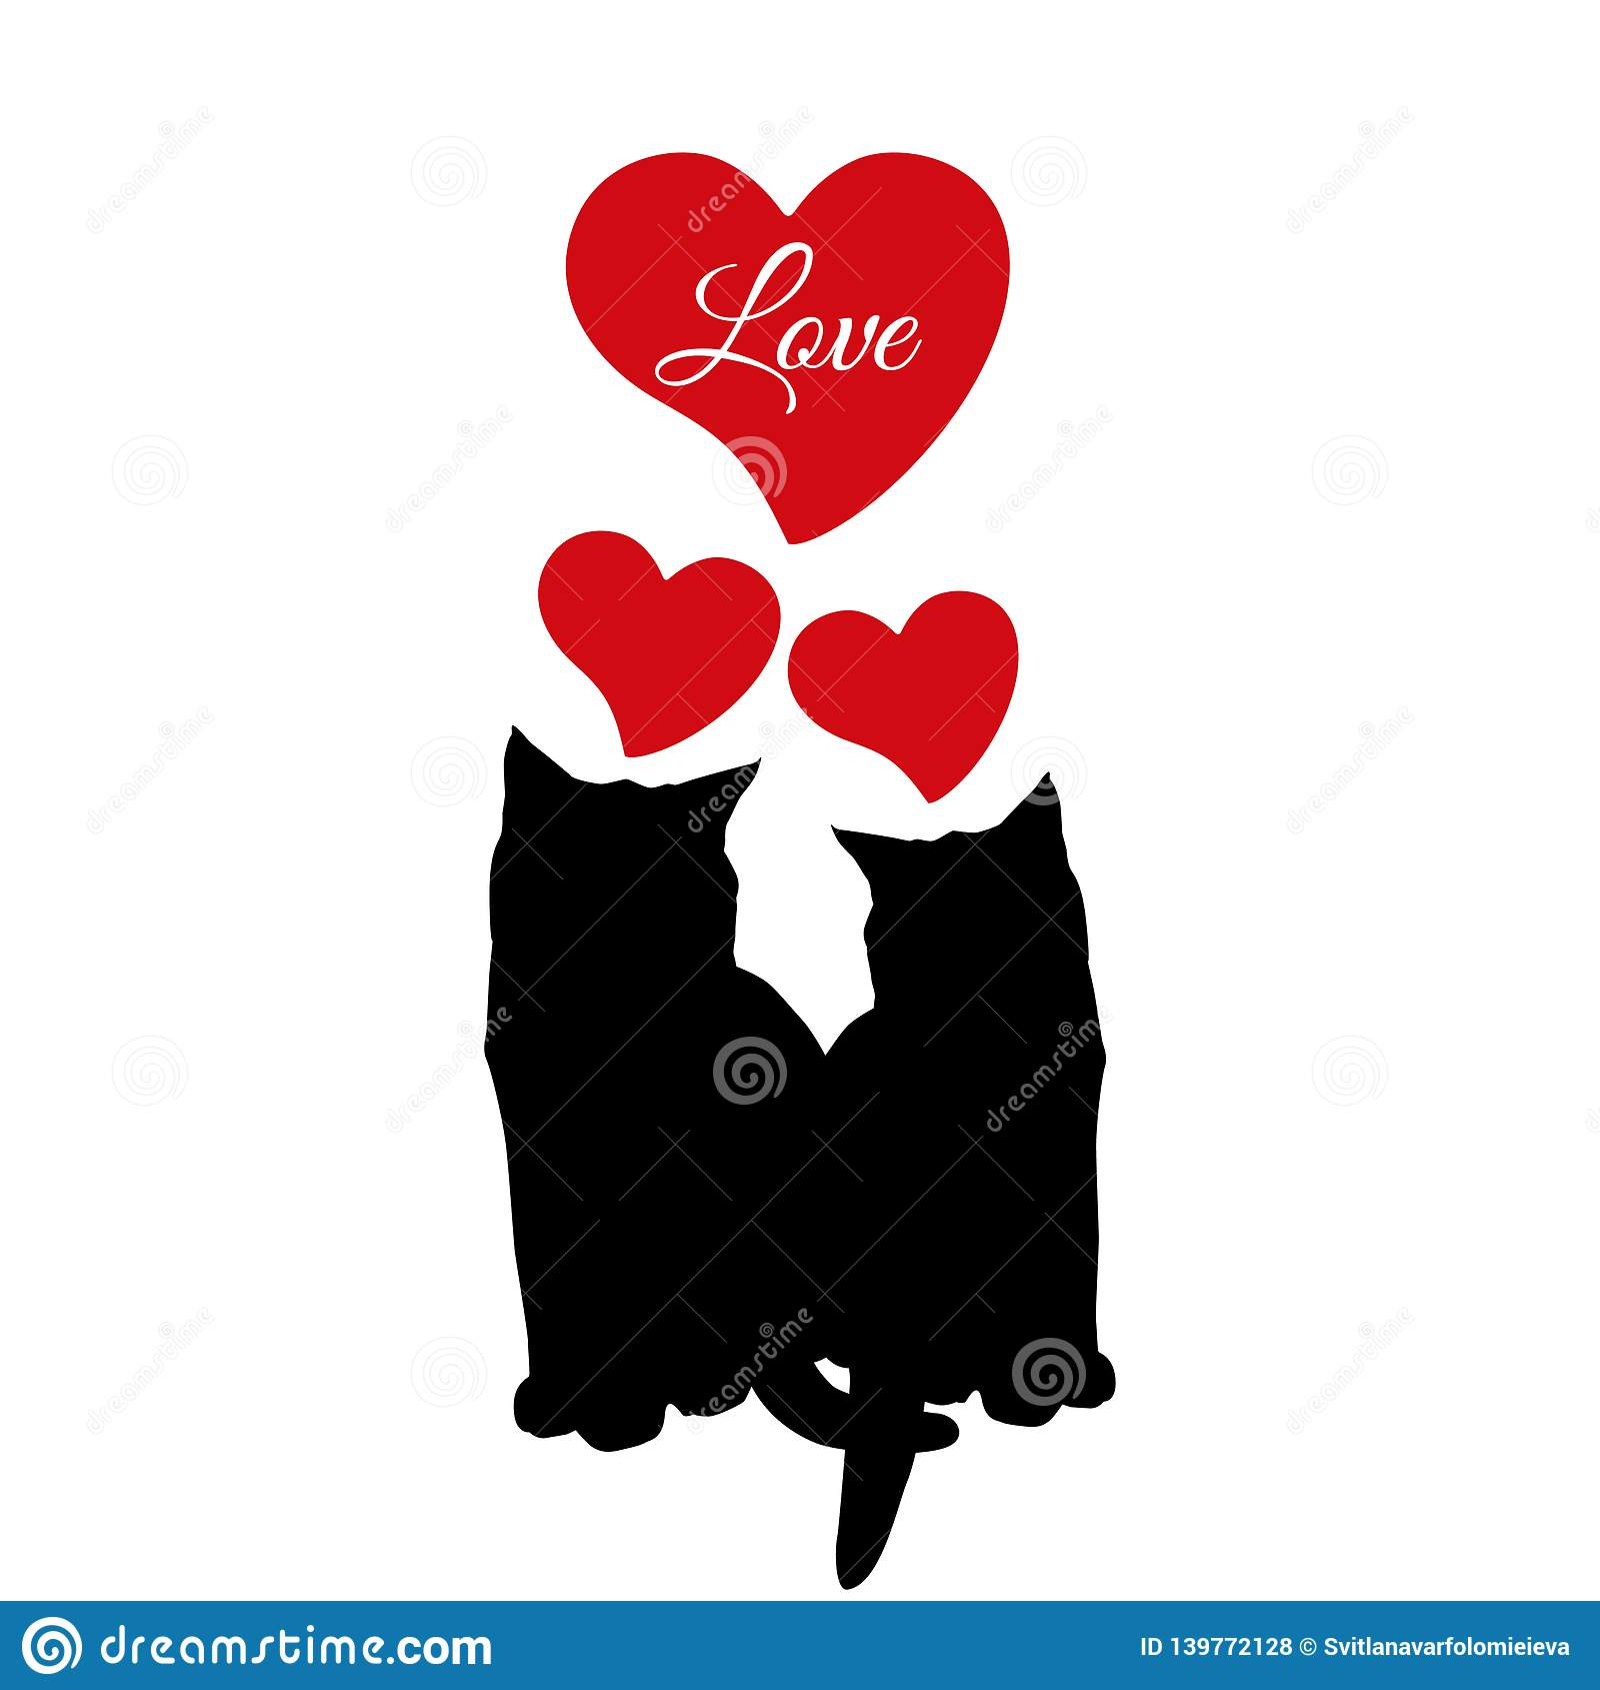 Cat love couple black silhouette, vector illustration